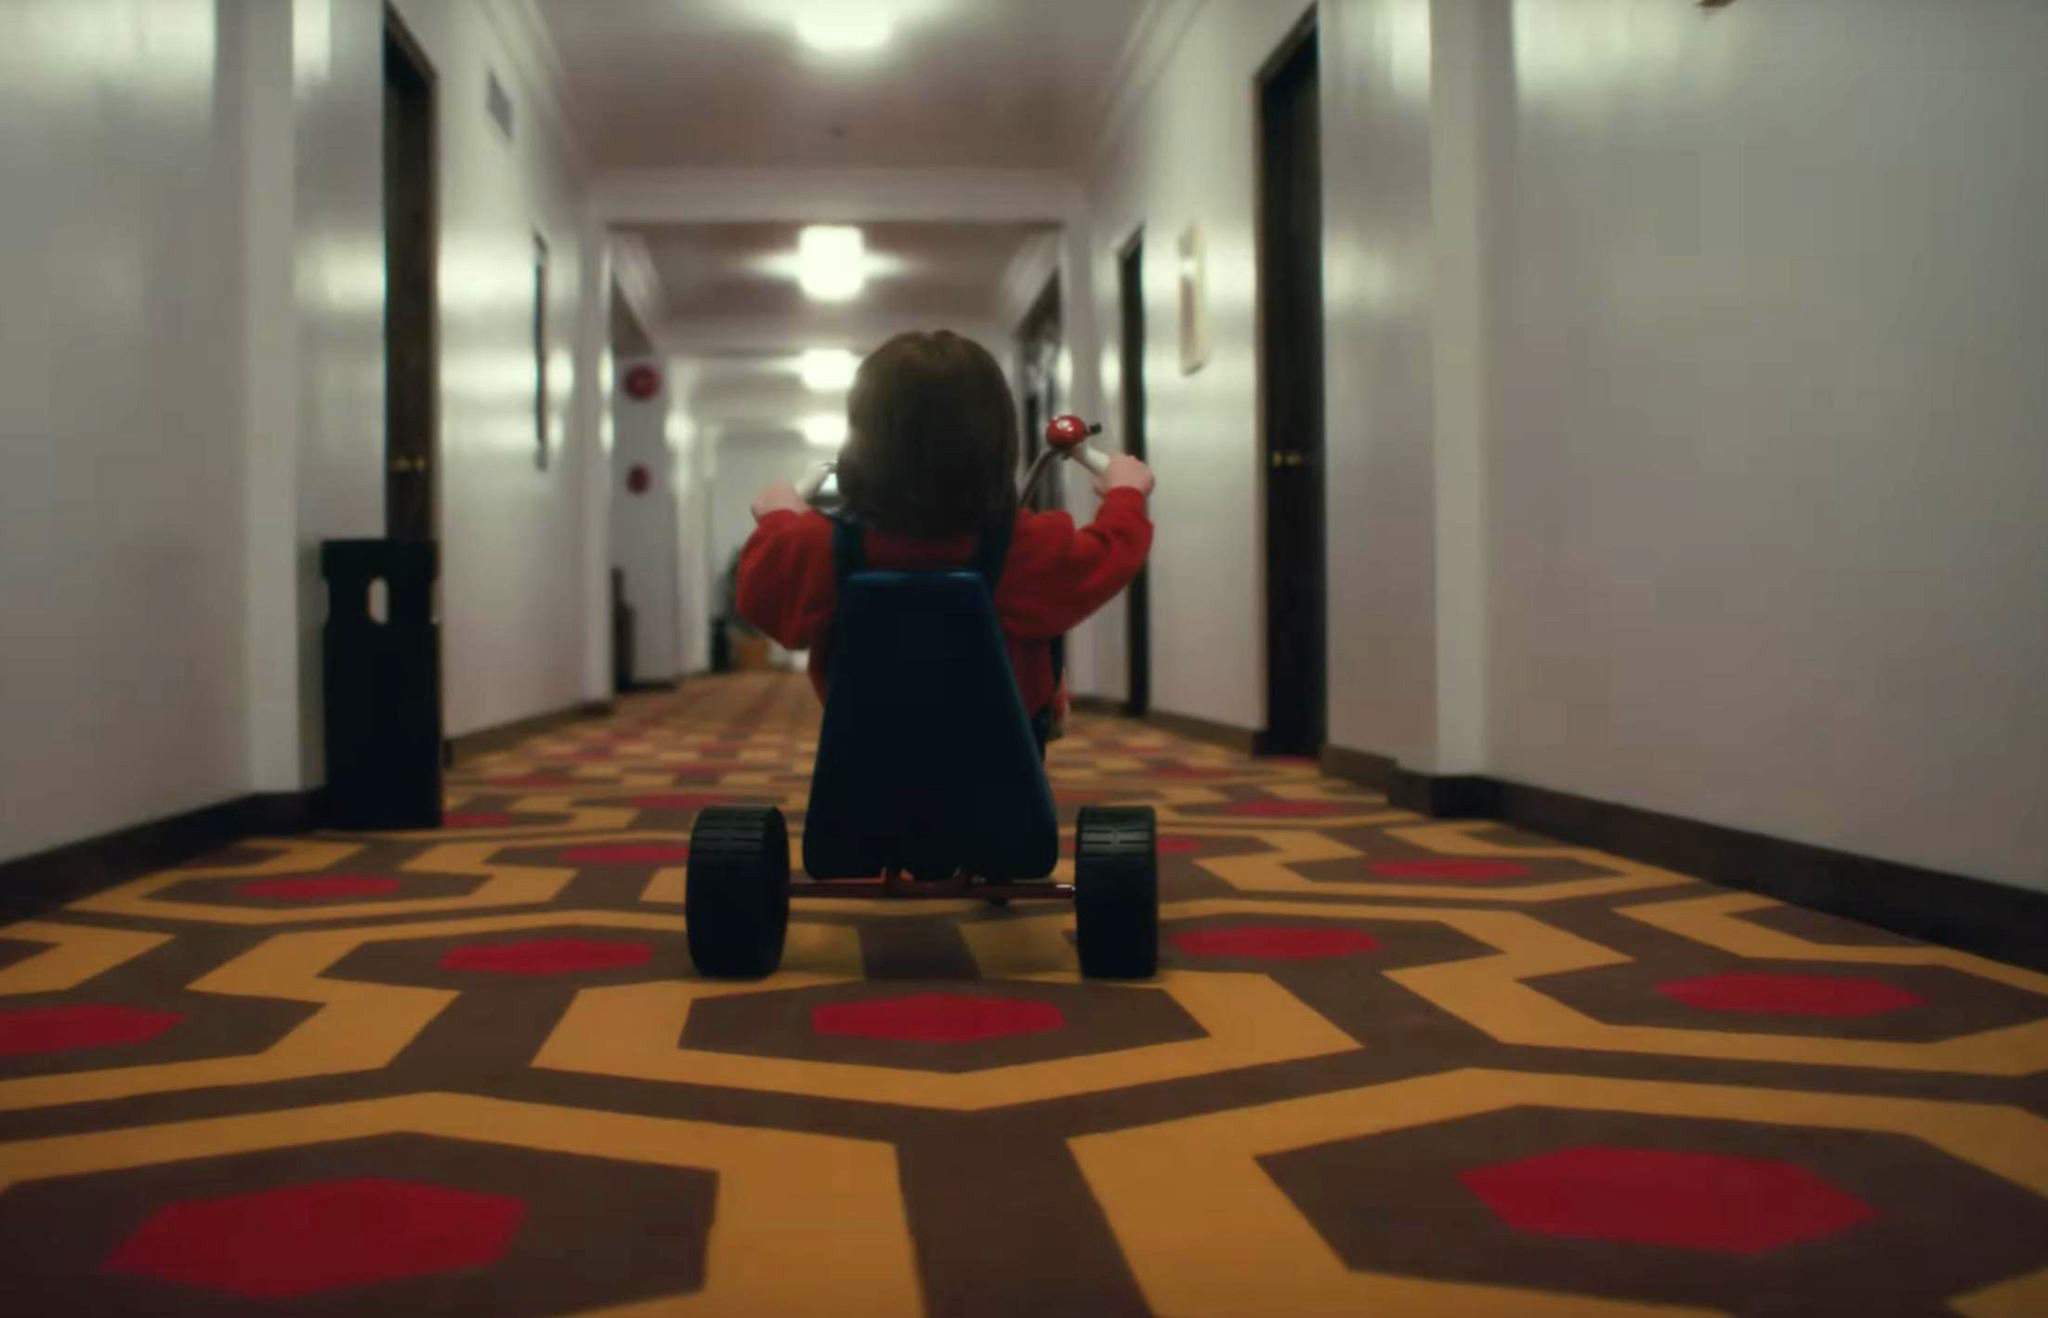 'Doctor Sleep' Director on Recreating Kubrick's Iconic 'Shining' Scenes and Banning Jump Scares